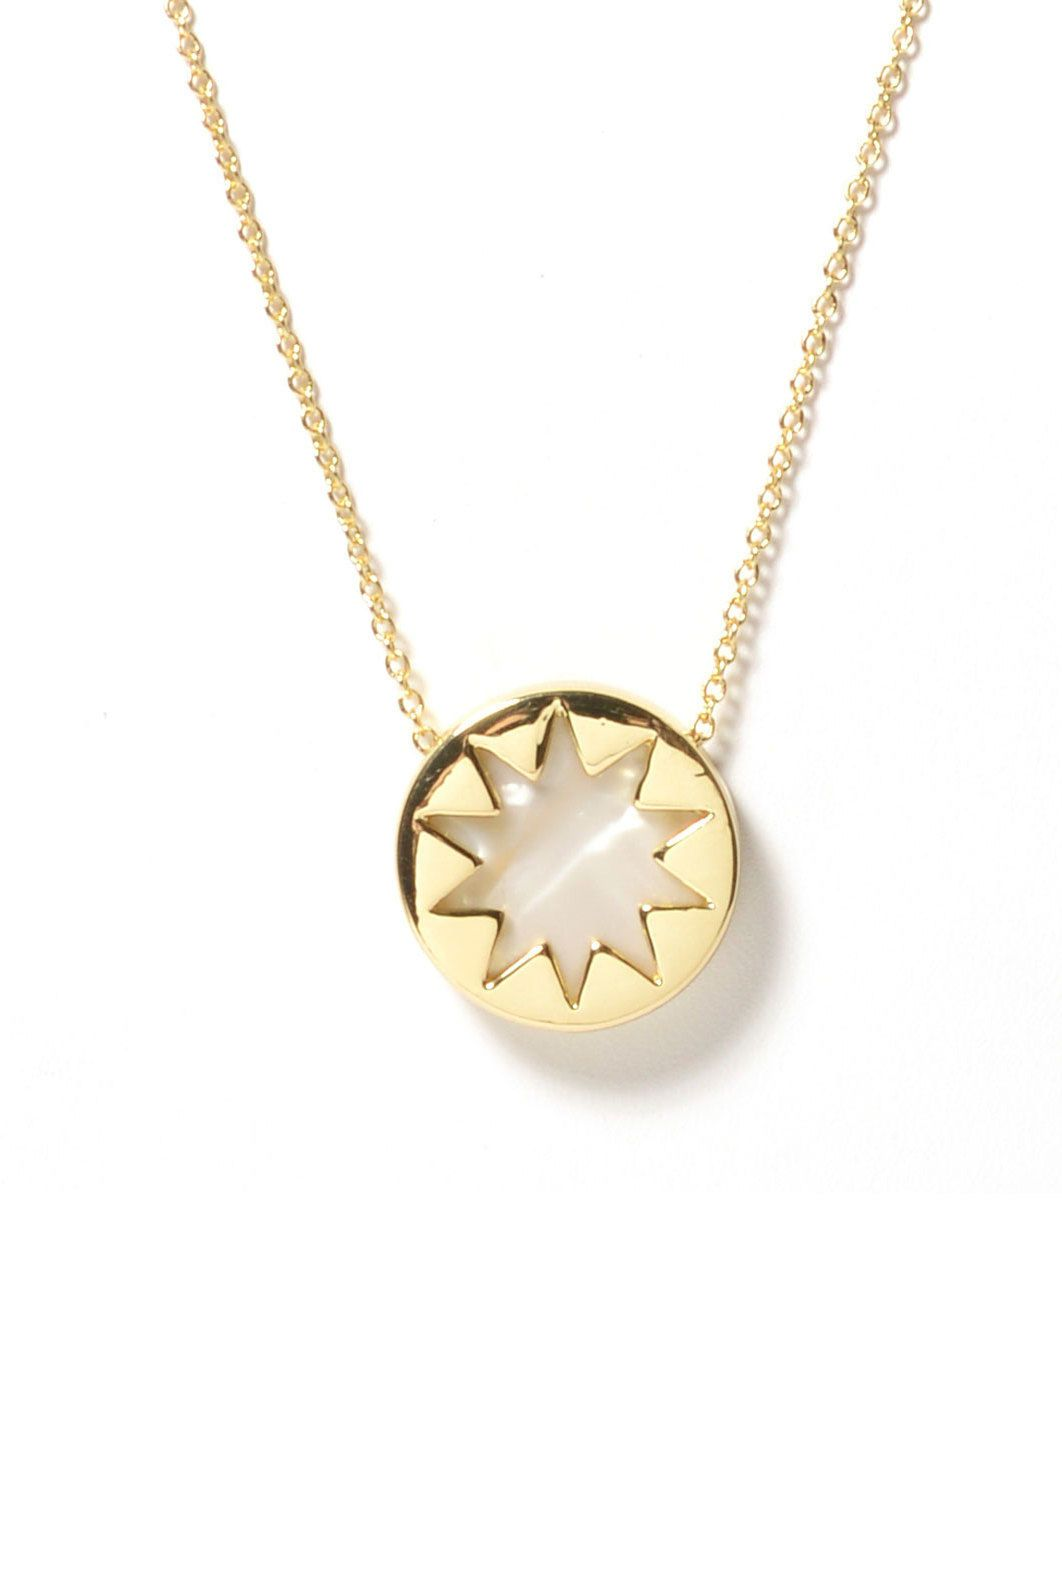 House Of Harlow Mini Sunburst Pendant Necklace in Metallic Gold l6sZ1xKP5L